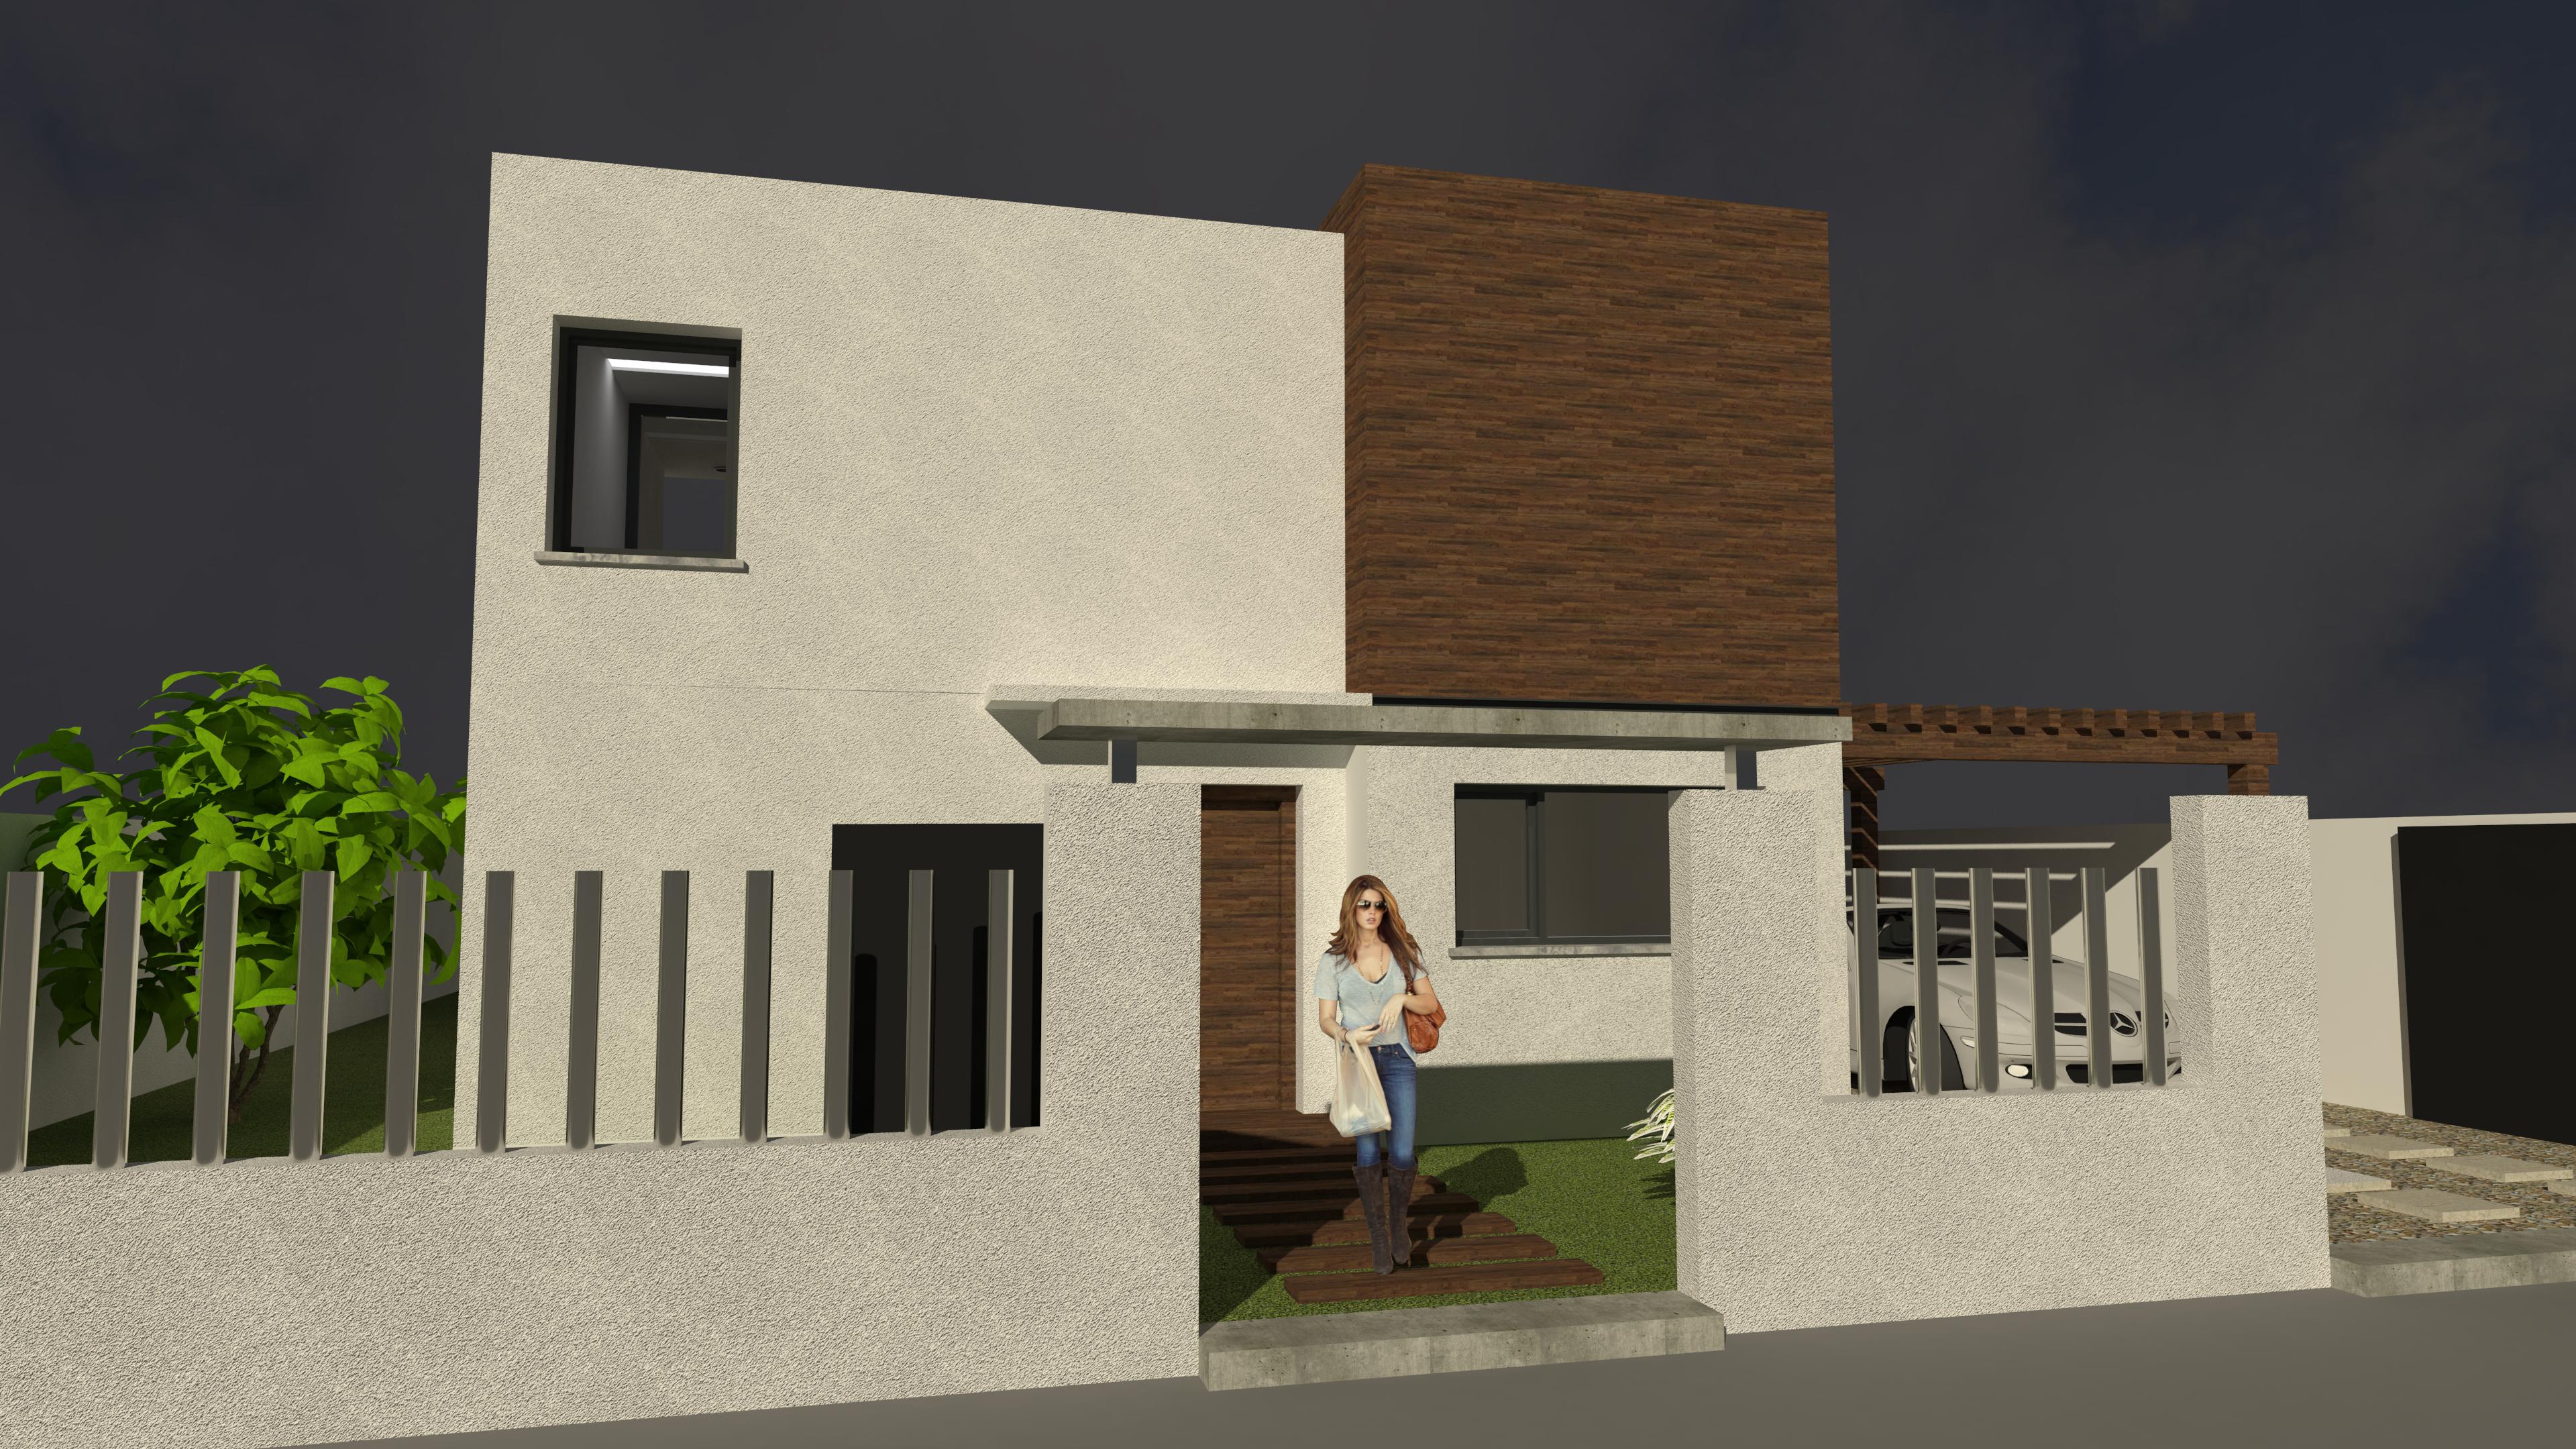 proyecto vivienda